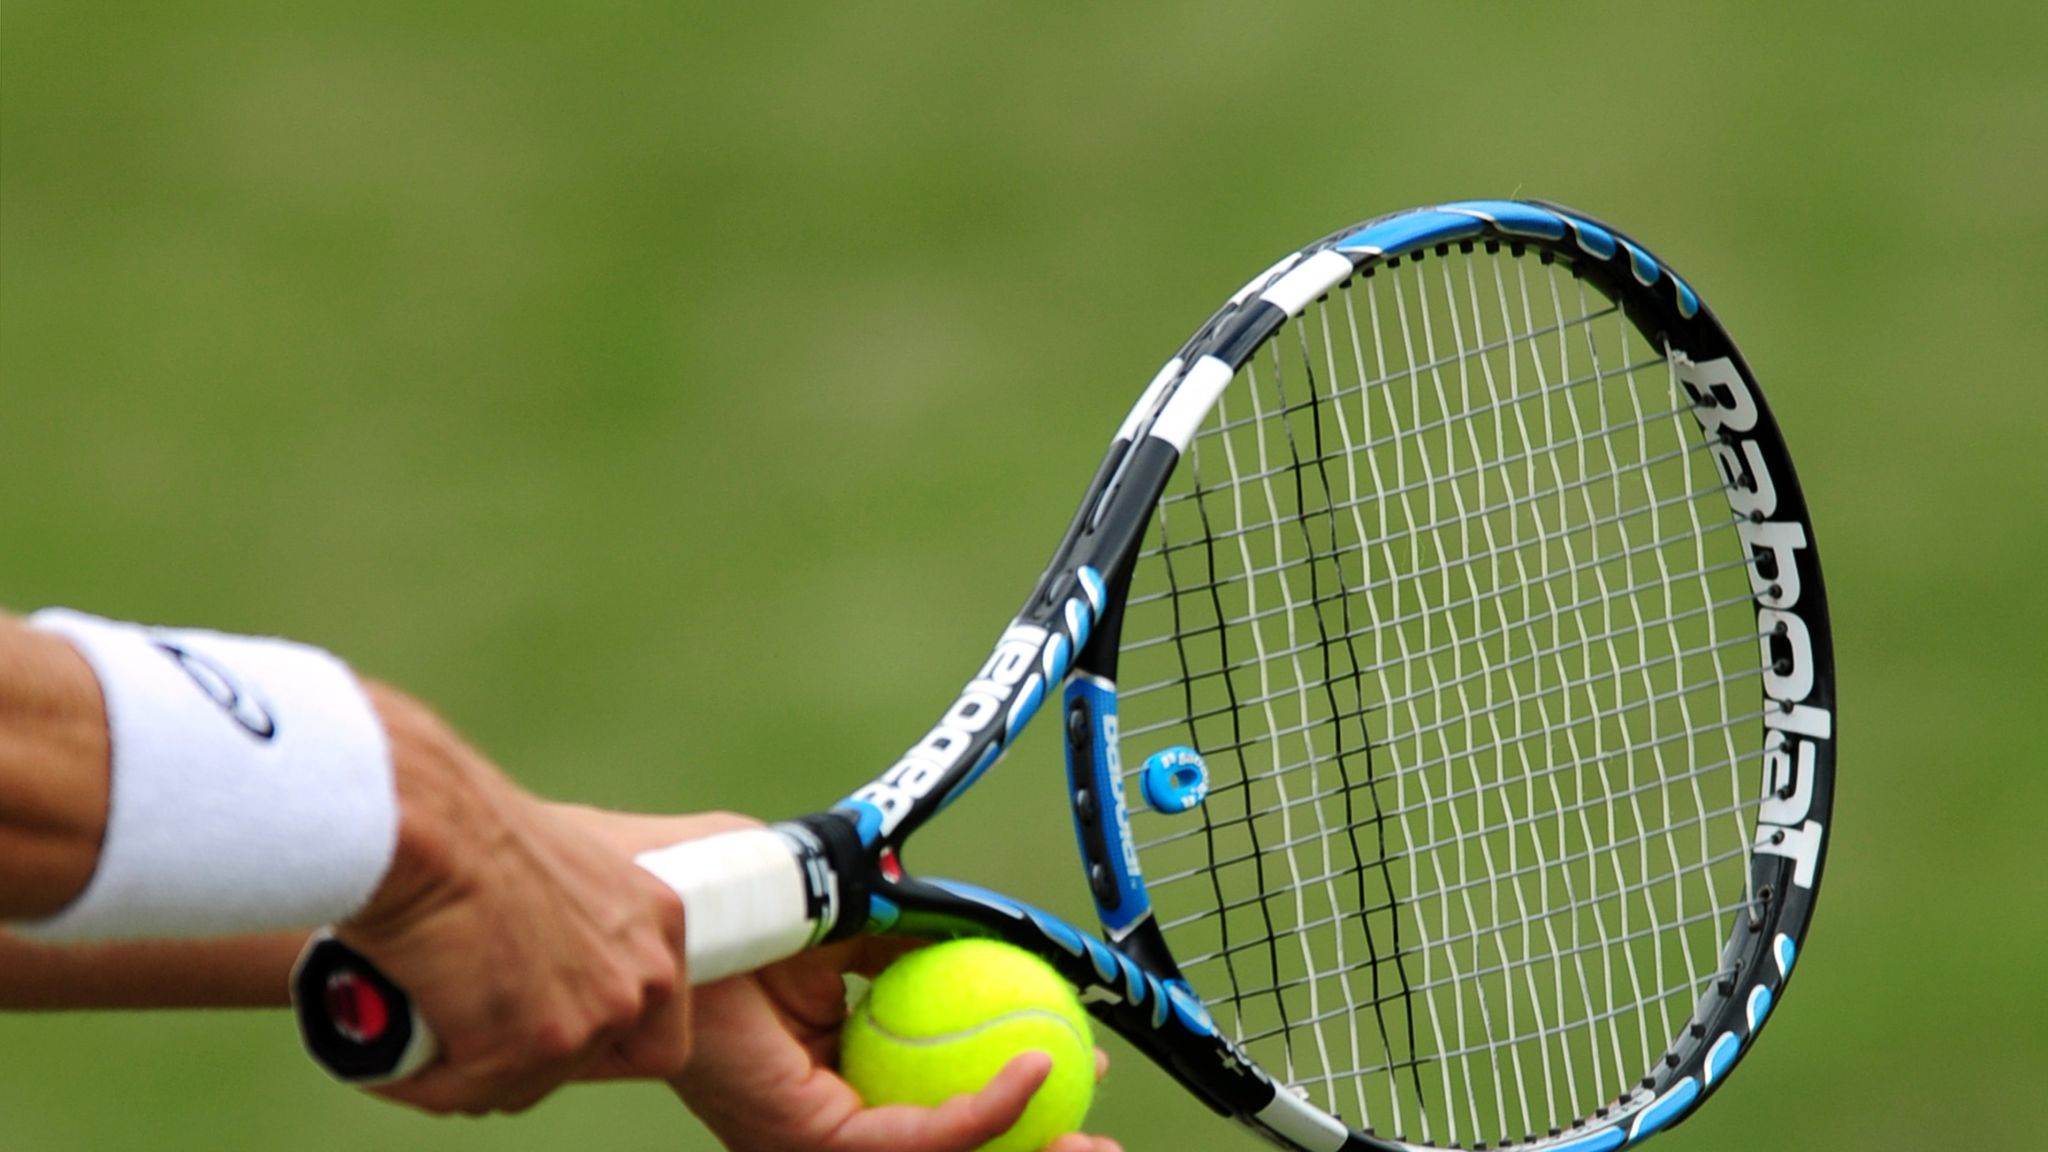 ATP Tour Lift Ban On Betting Sponsorship